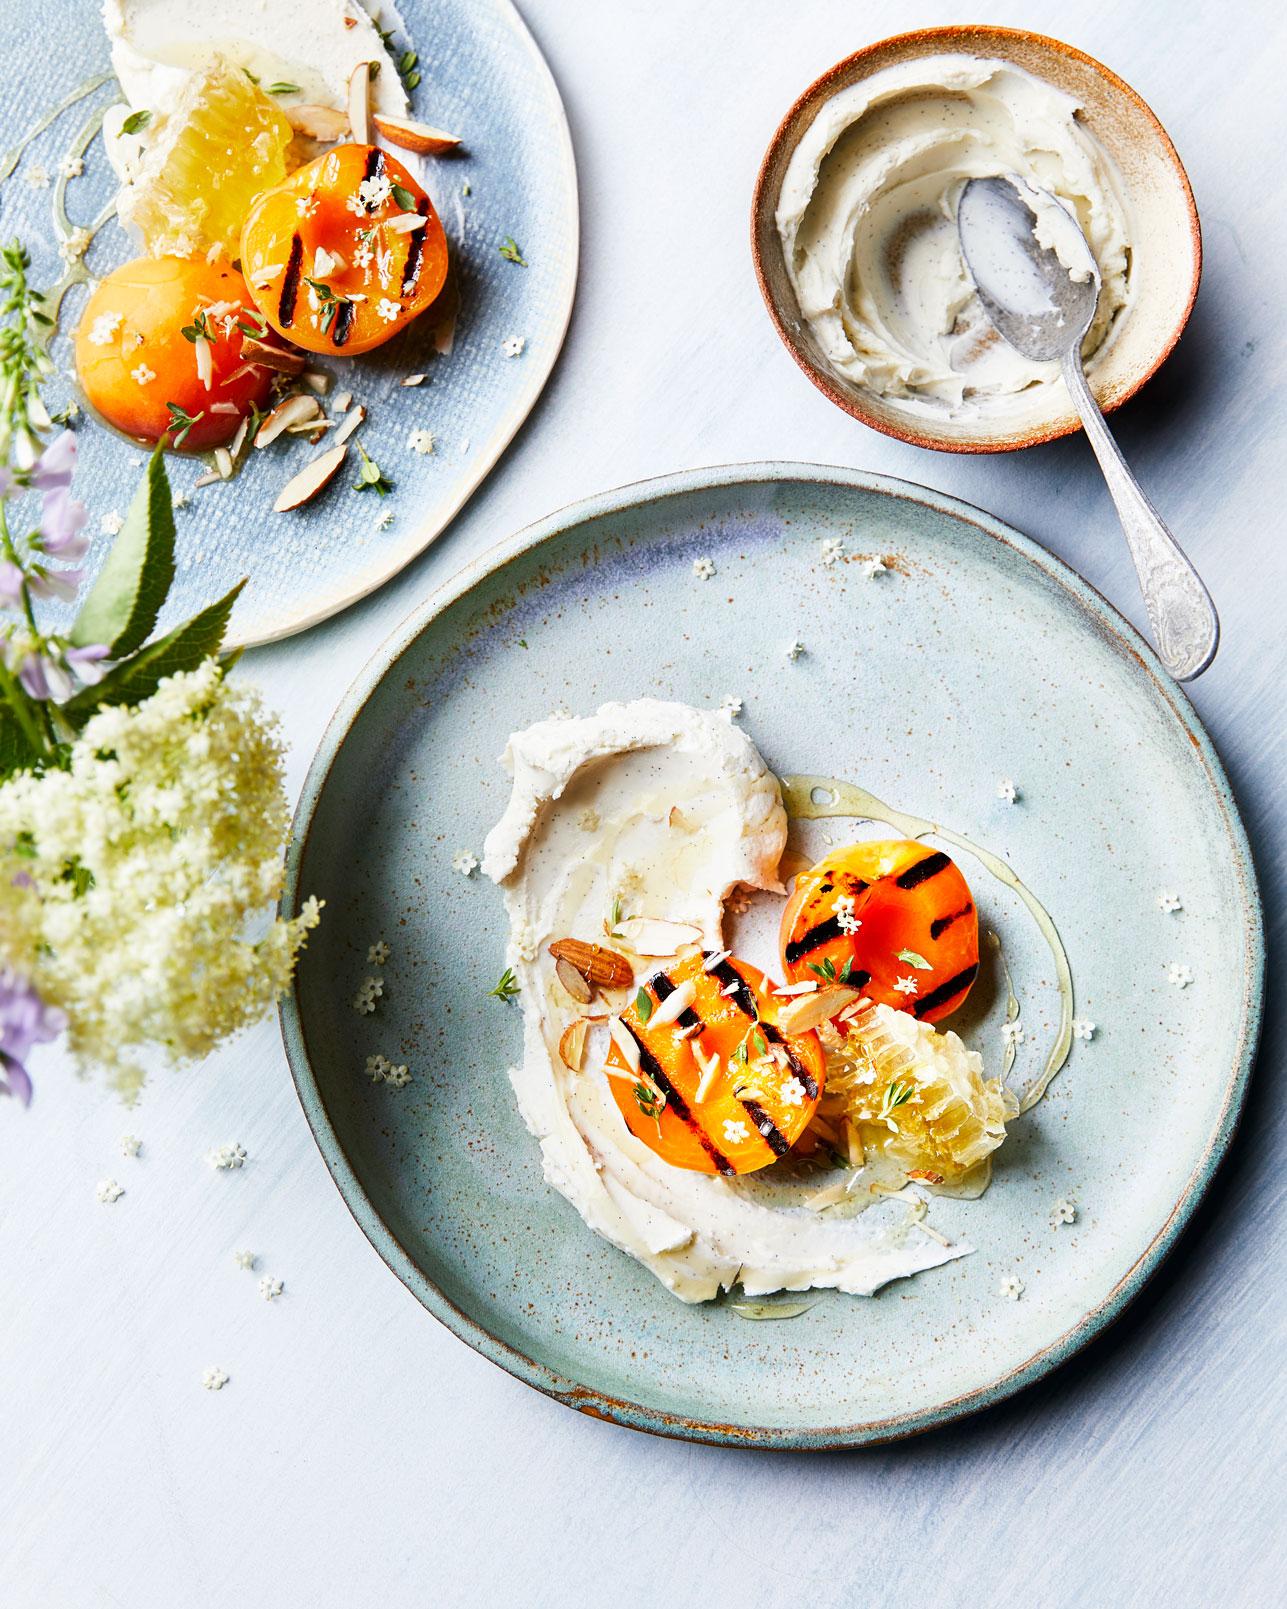 Food Stylist: Tamara Vos Prop Stylist: Sarah Birks